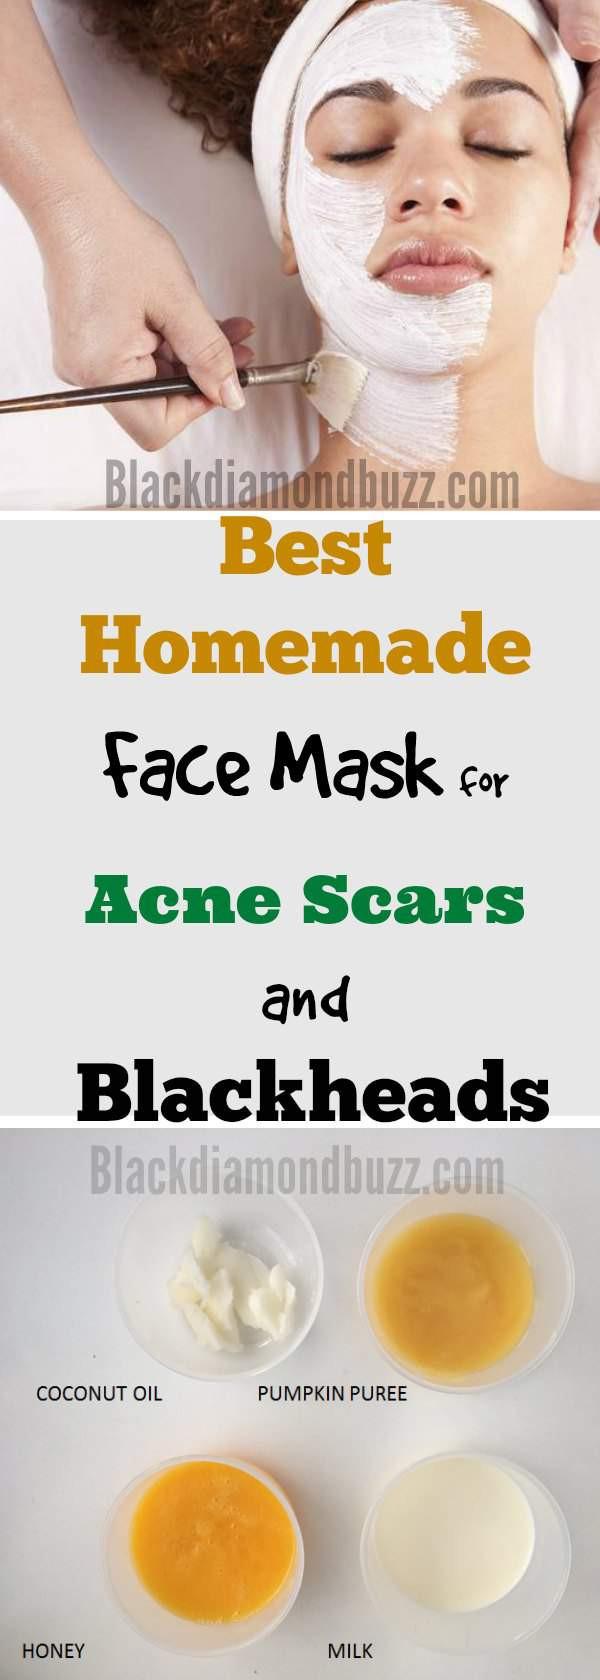 DIY Acne Face Mask  DIY Face Mask for Acne 7 Best Homemade Face Masks